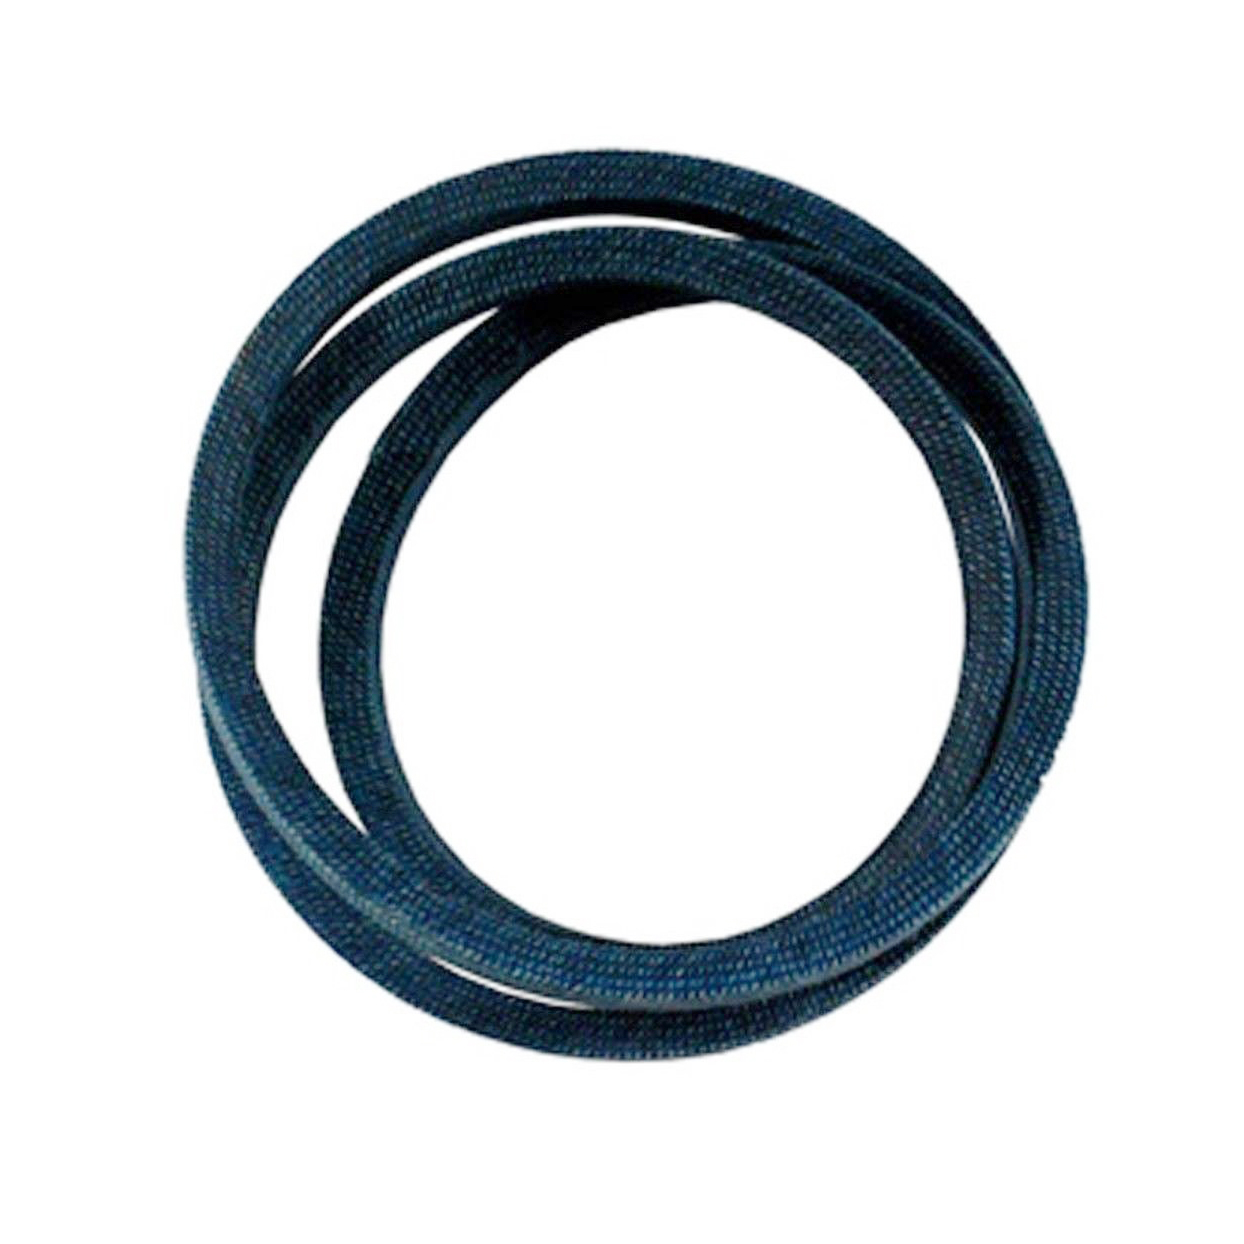 Genuine Briggs /& Stratton 7100883YP Belt 3L 32.86 Fits Murray Simplicity Snapper